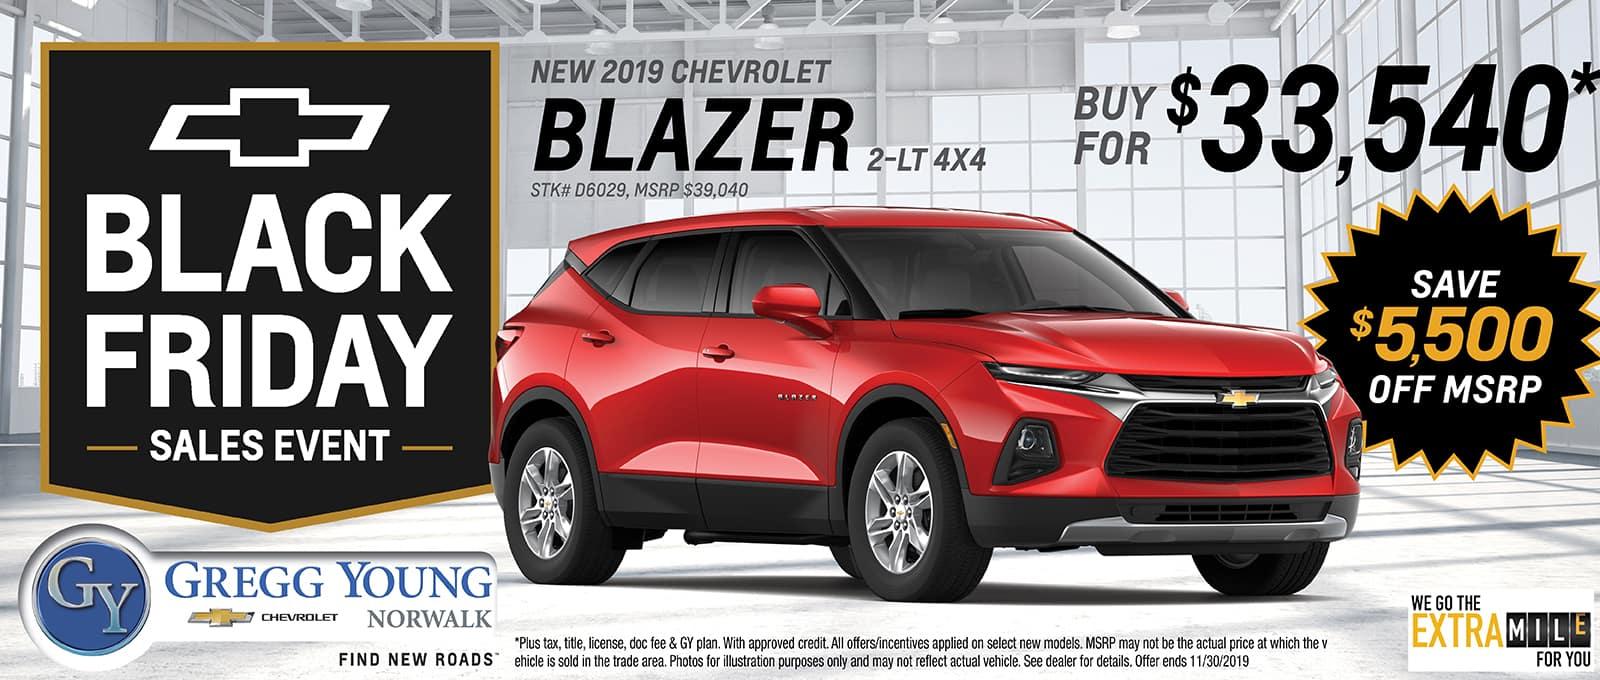 2019 Chevy Blazer